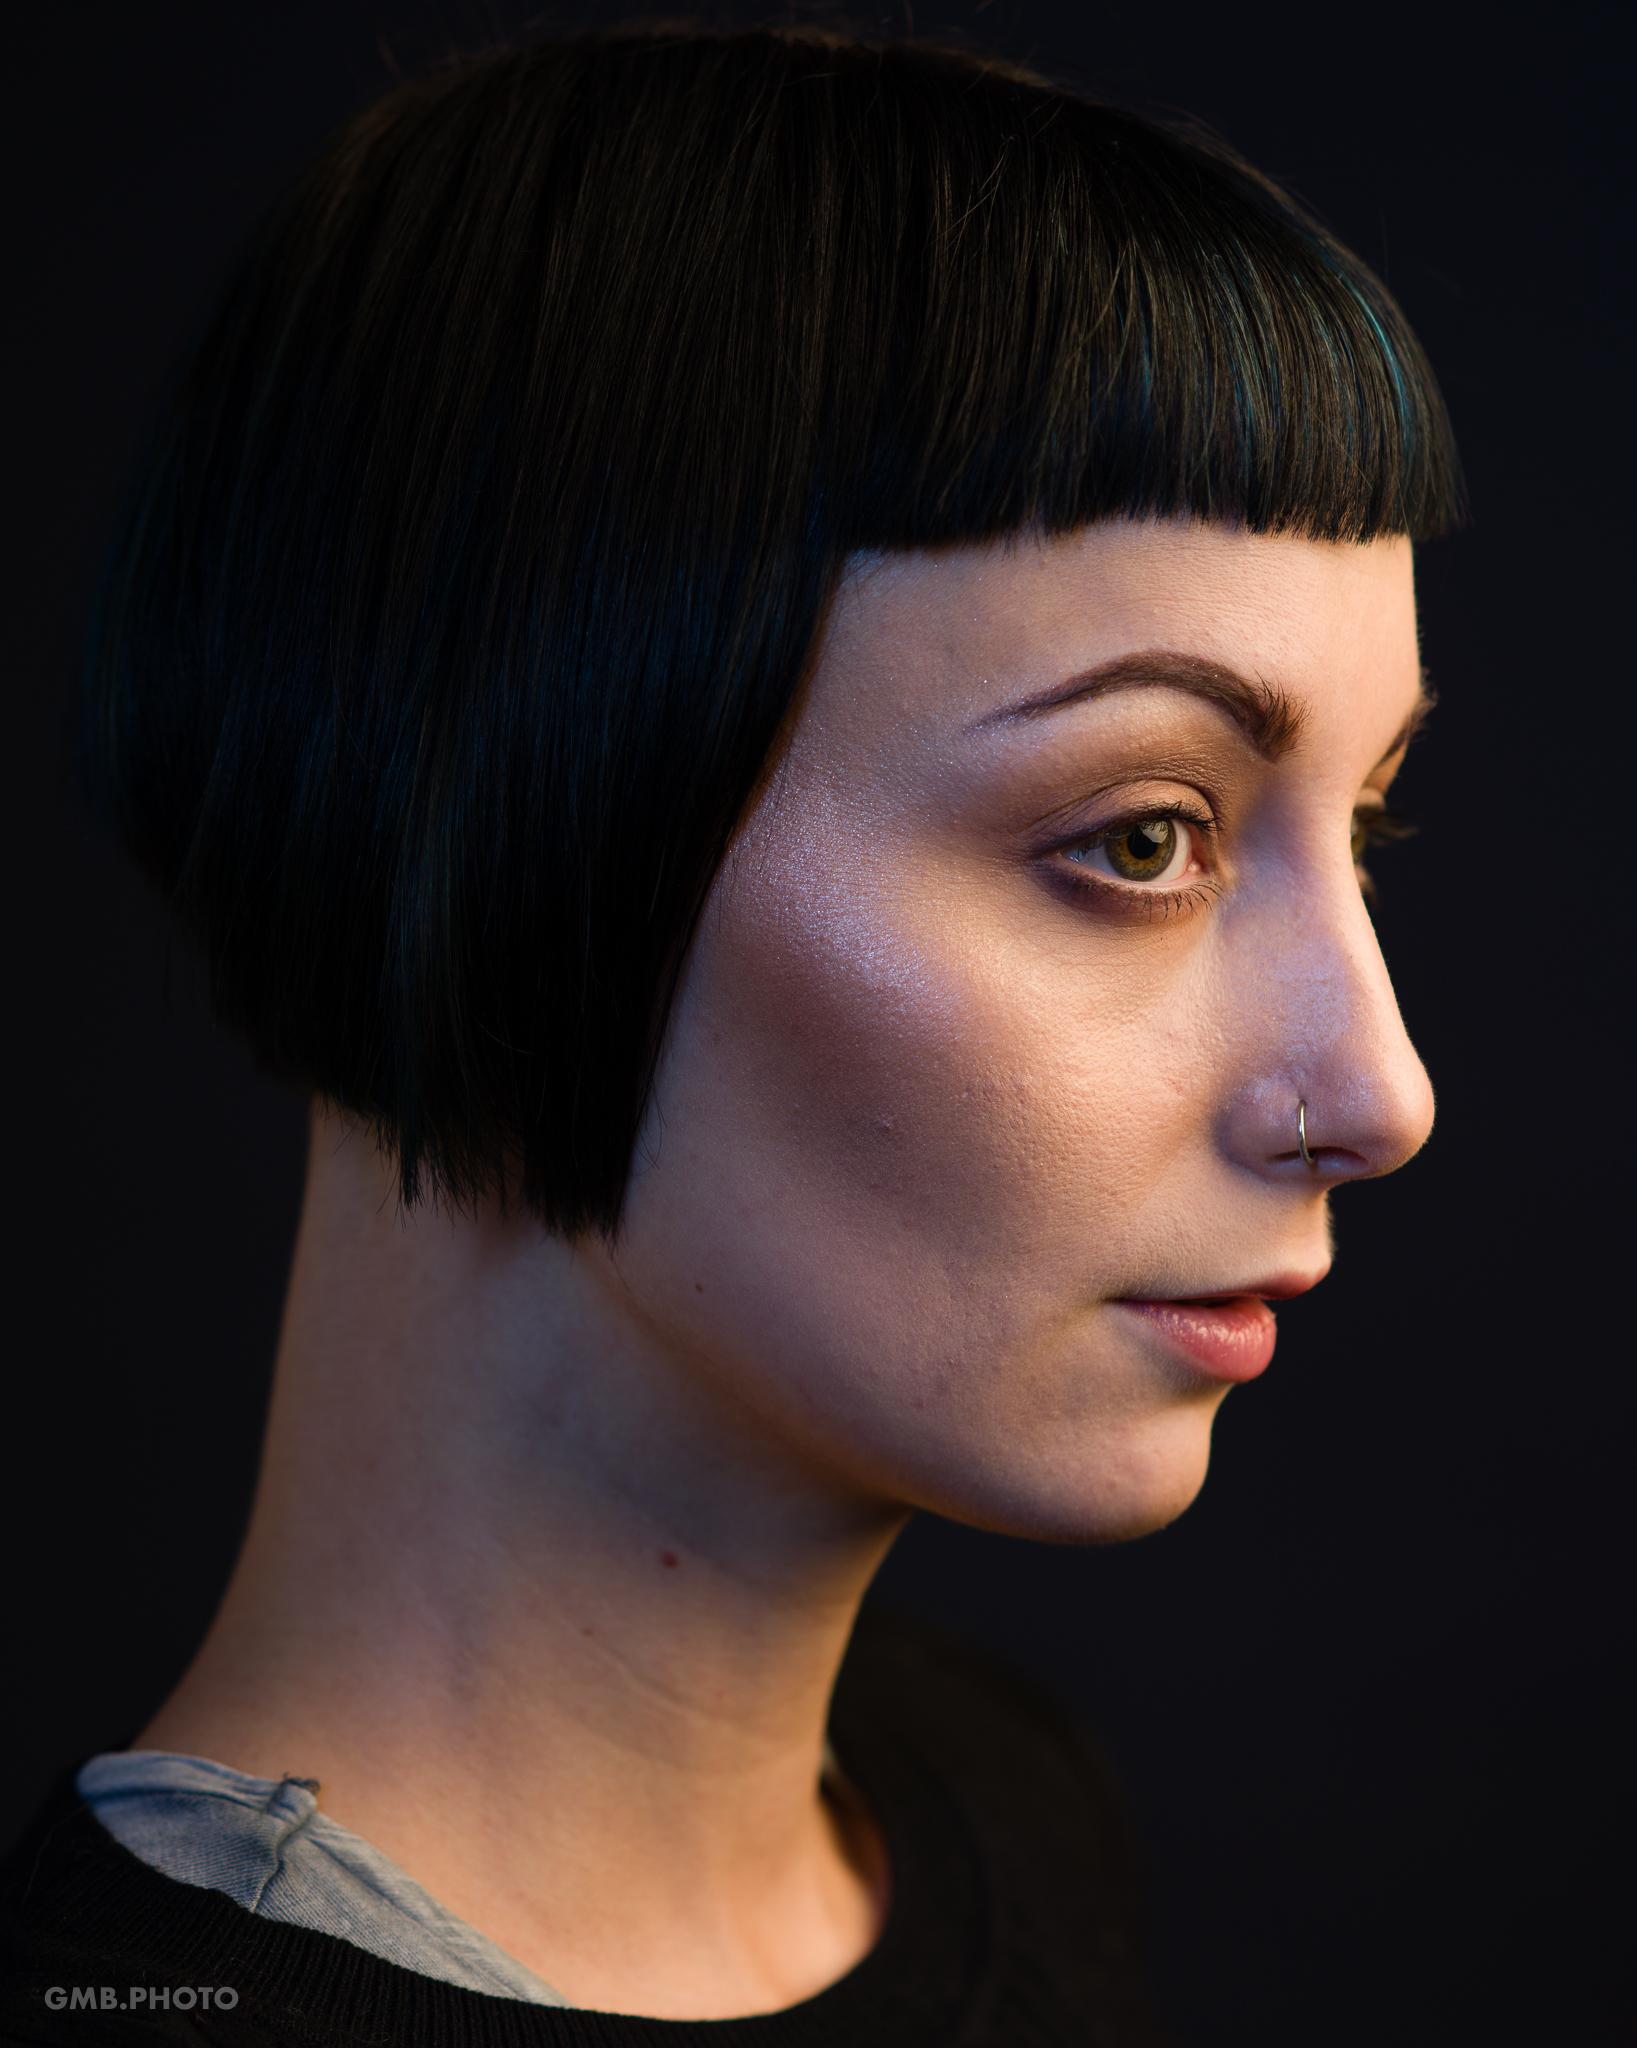 2018-02-03 - Taylor, Marie Jean - Experimental Portrait Shoot -NIKON D800E-GMB_0855-.jpg